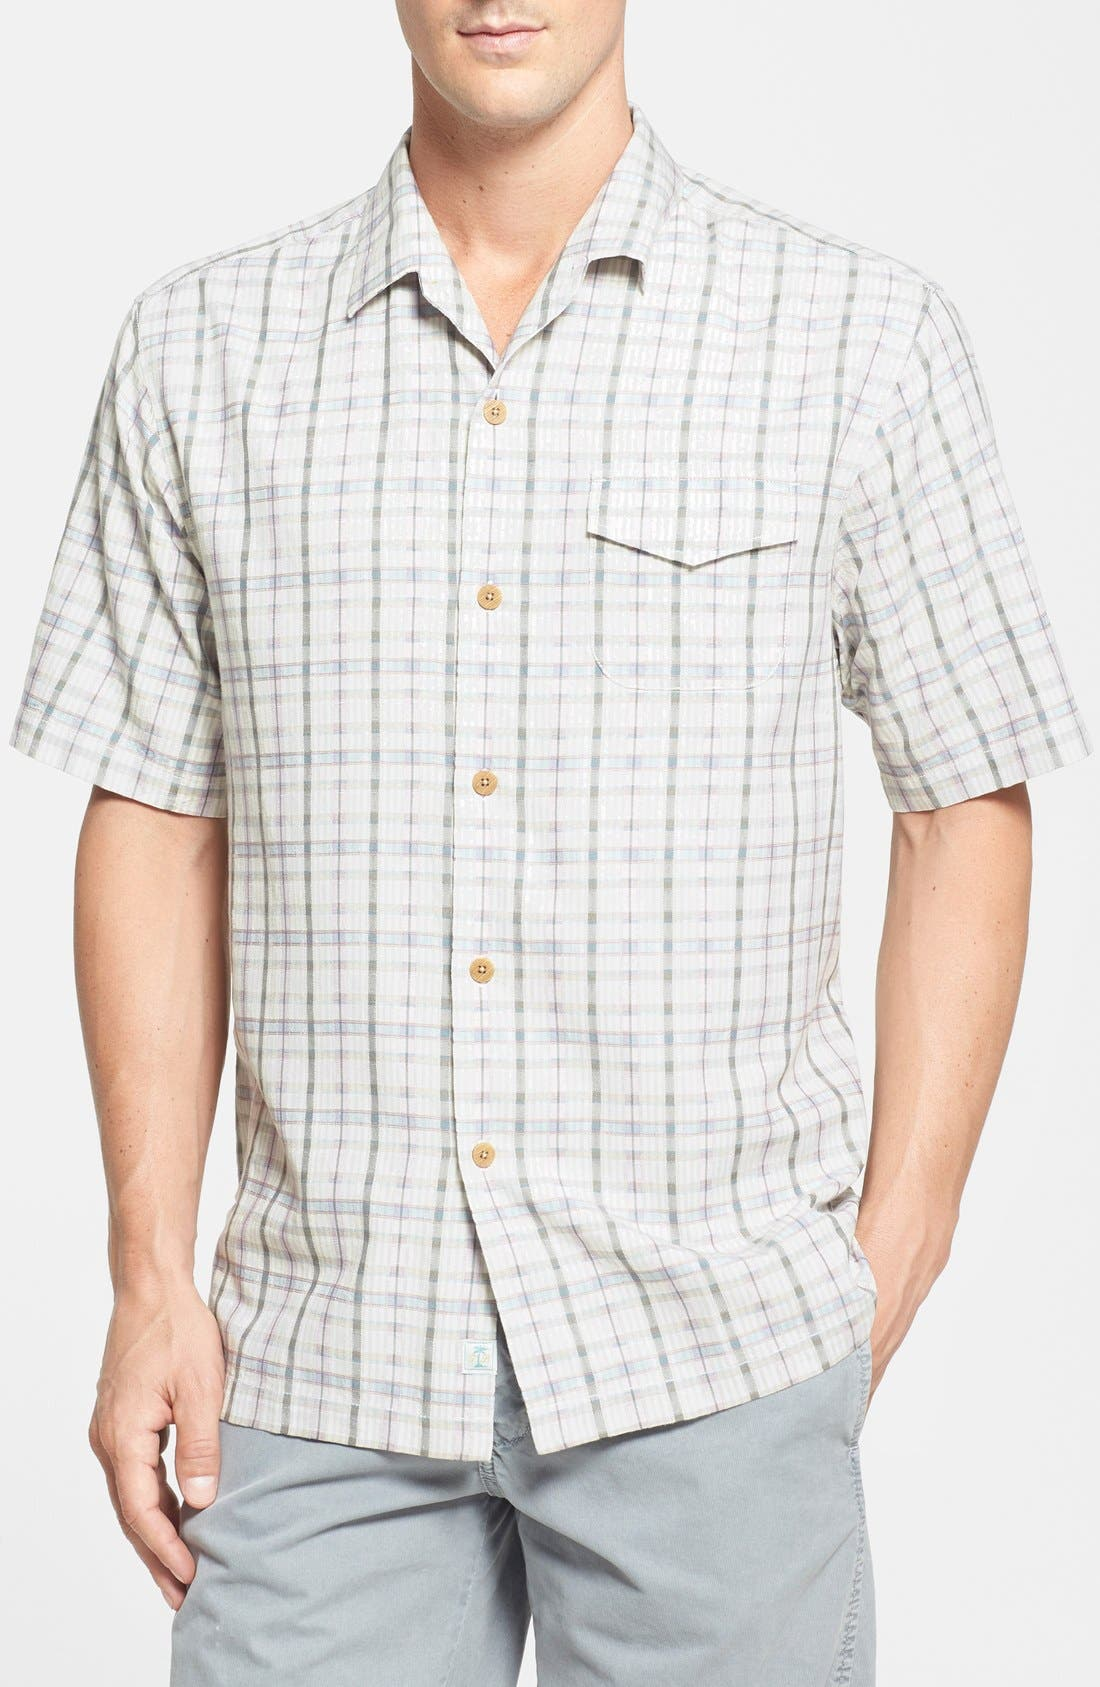 Alternate Image 1 Selected - Tommy Bahama 'Jammin' Plaid' Original Fit Plaid Silk Campshirt